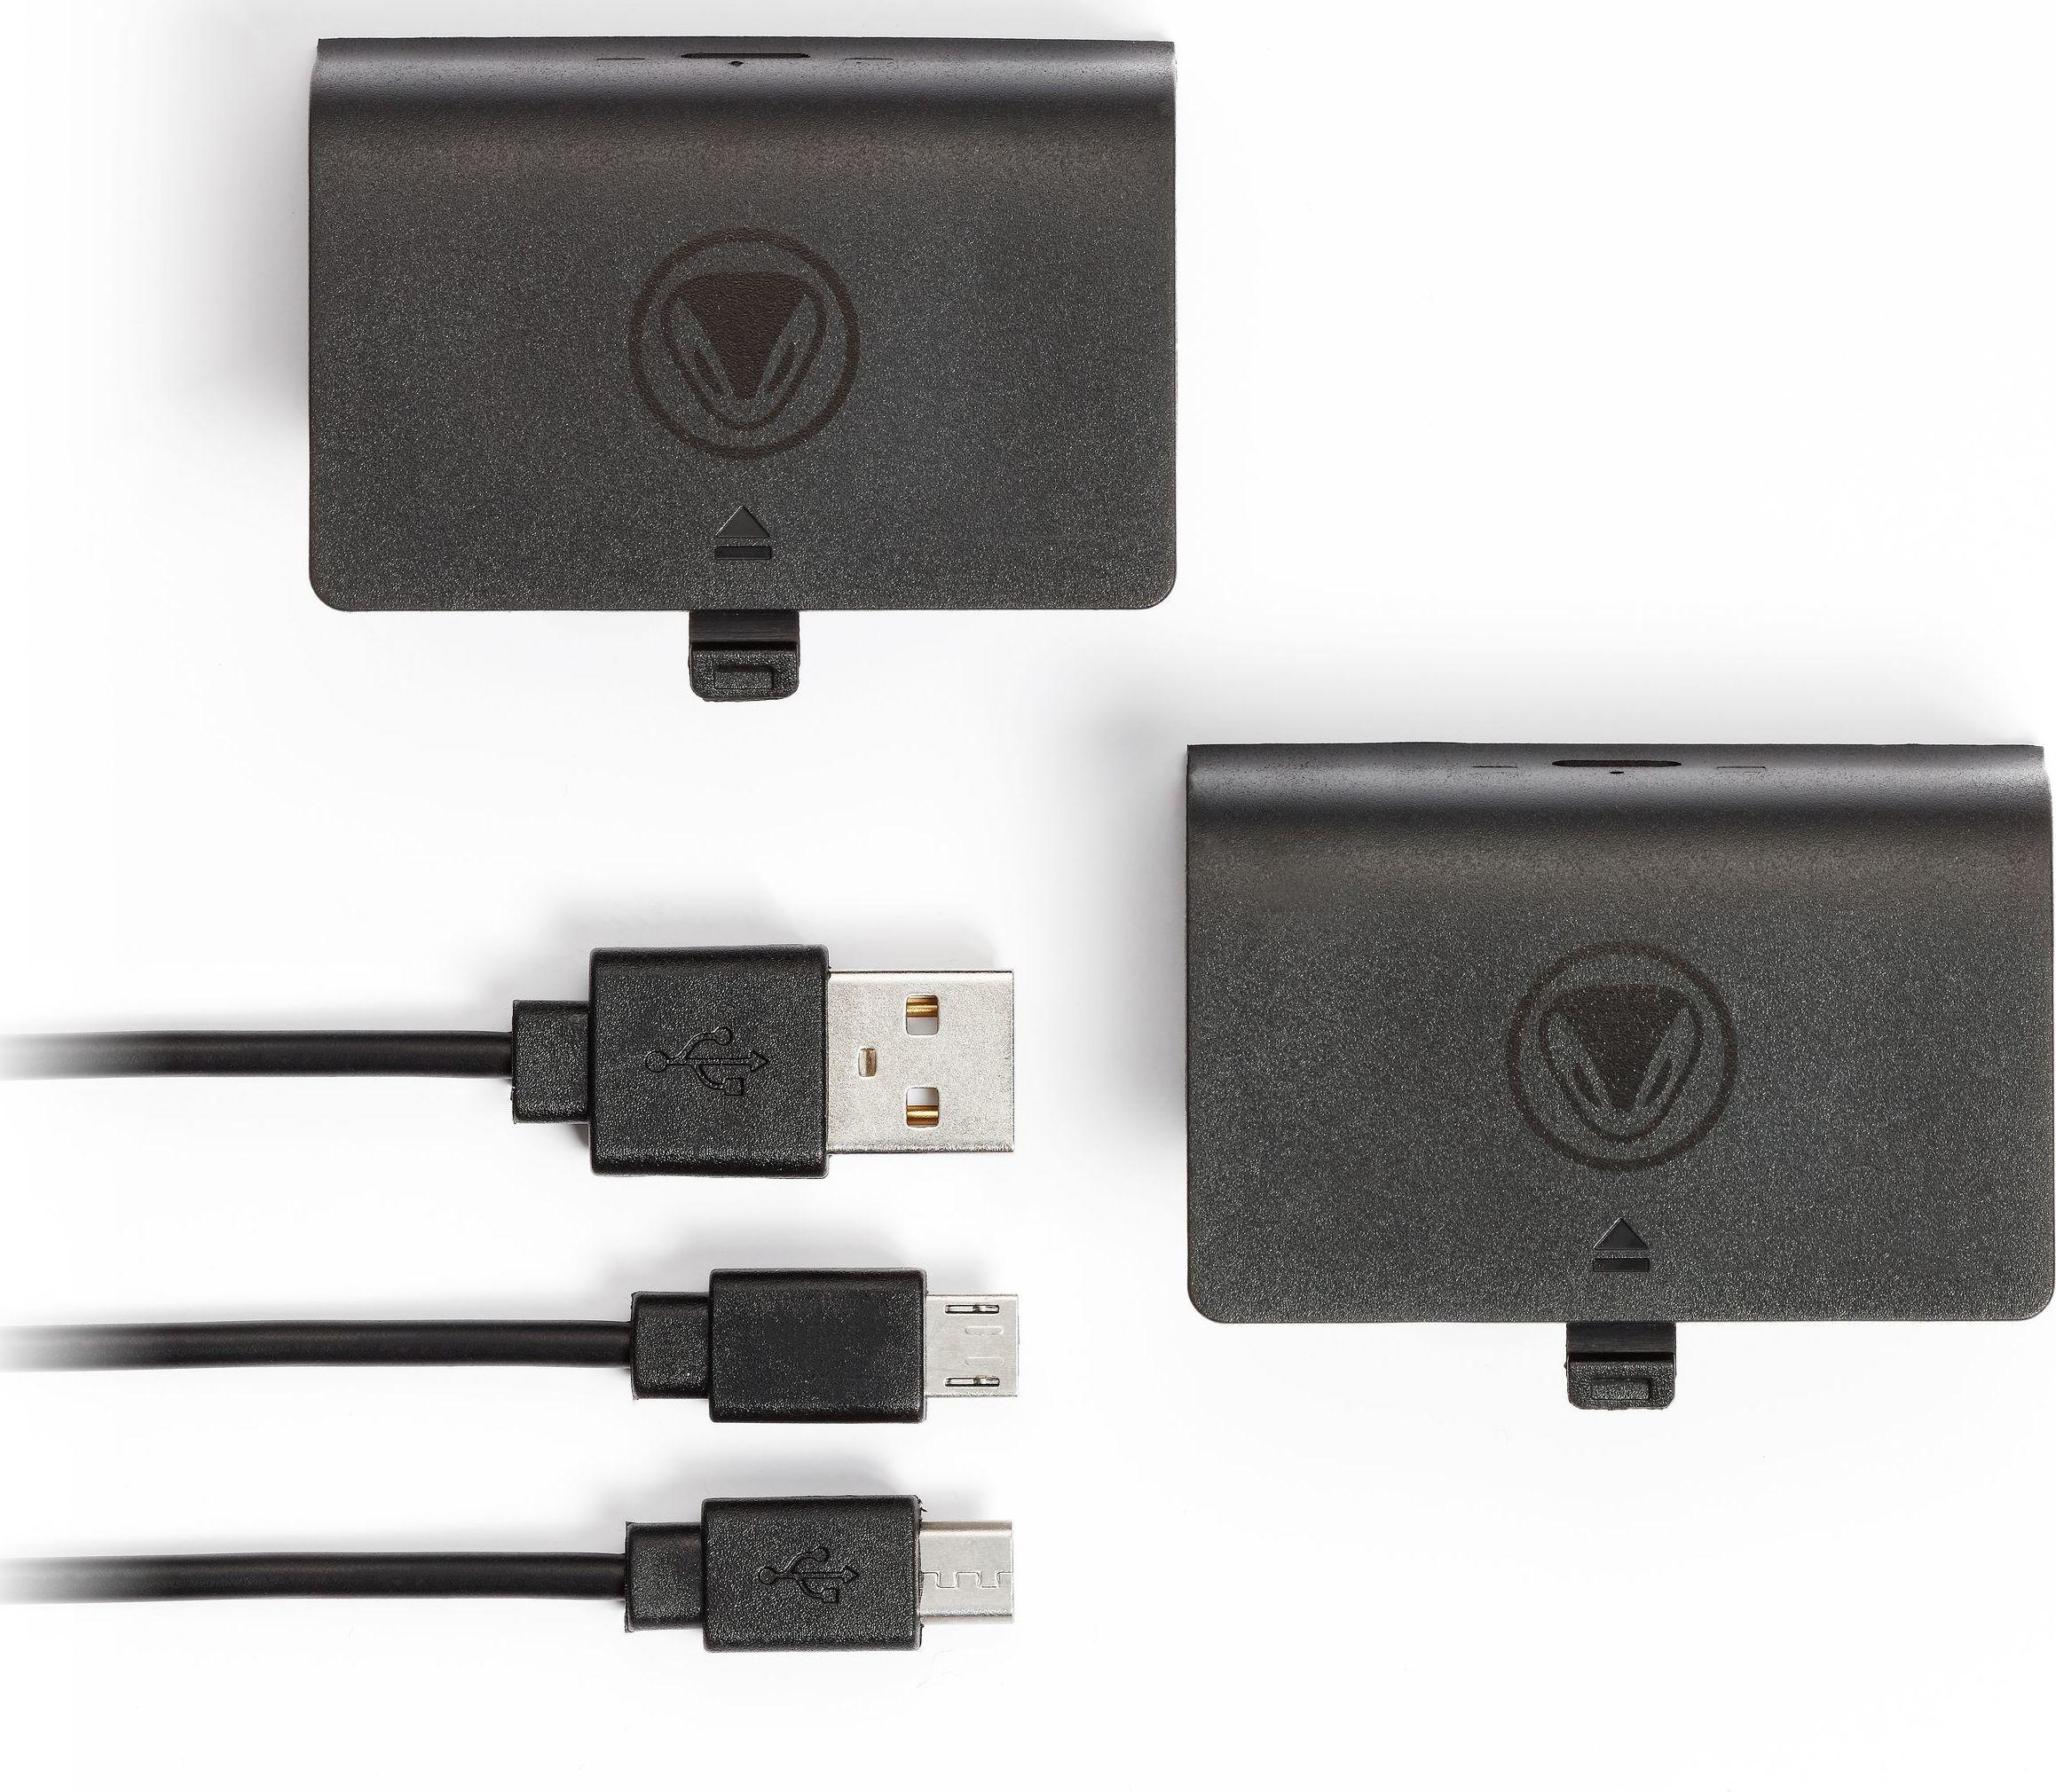 Snakebyte Akumulator do kontrolera XBOX ONE 2-pack 700 mAh czarne BATTERY:KIT